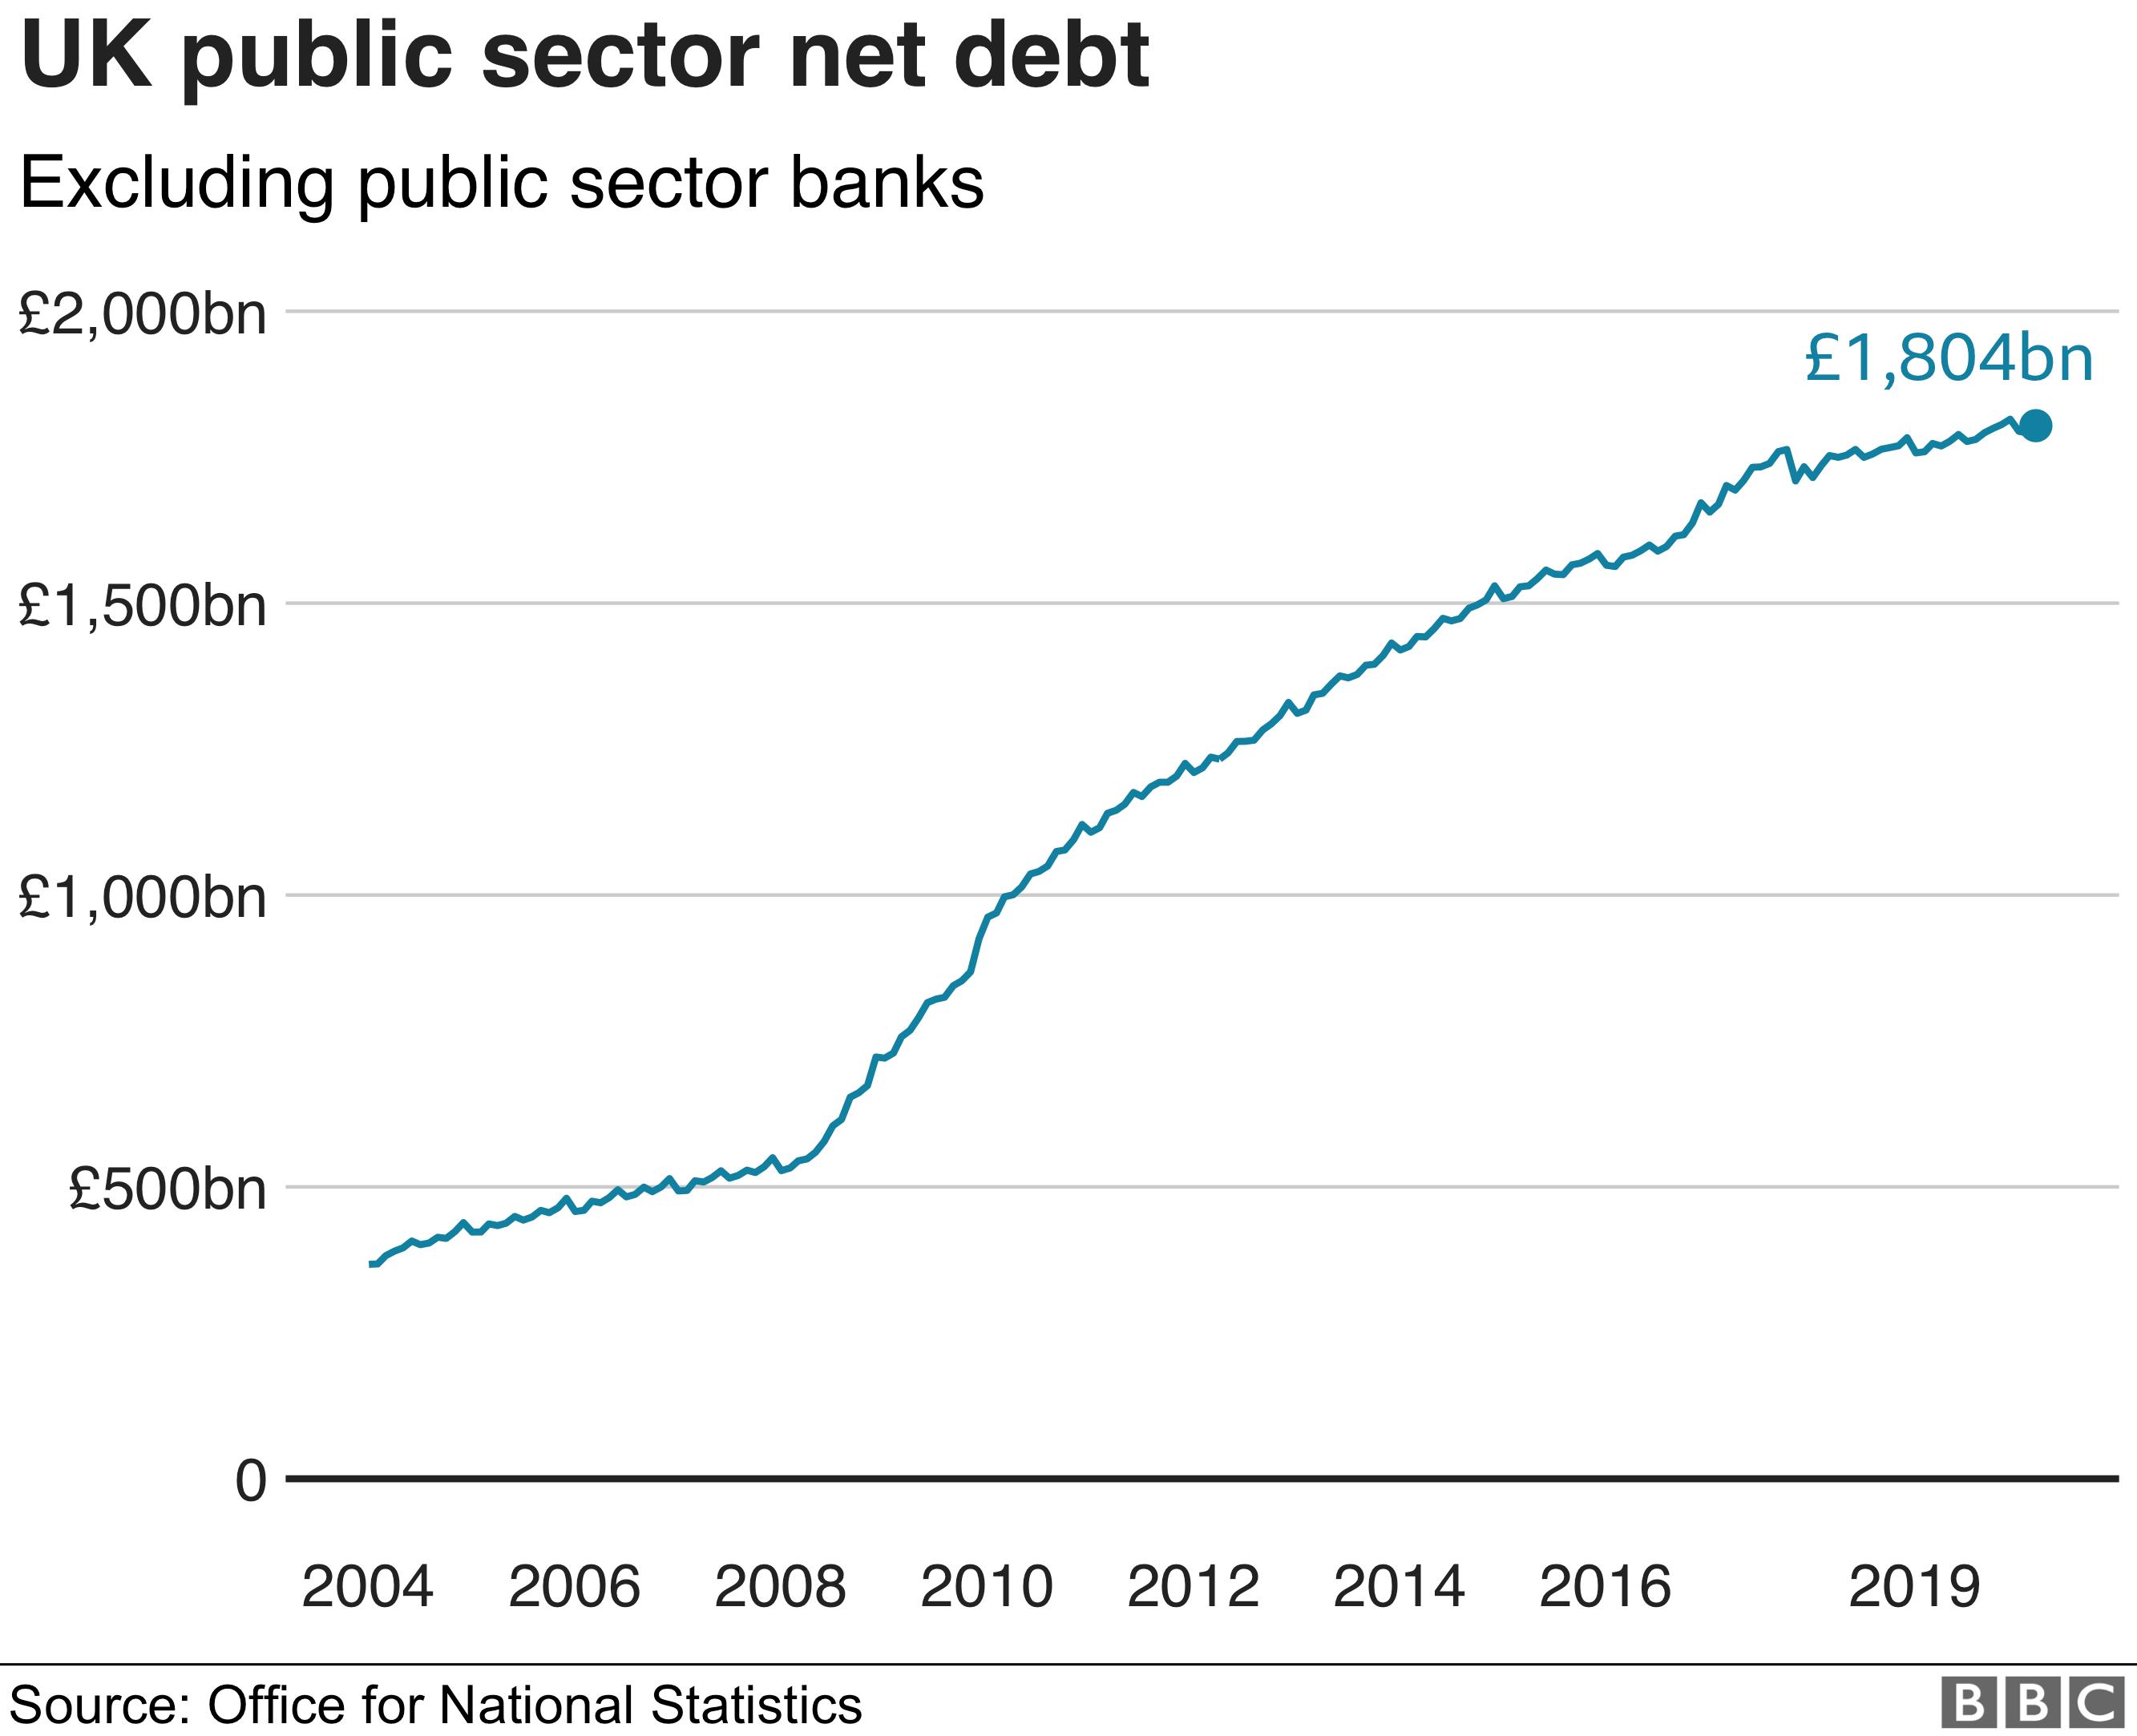 UK public sector debt